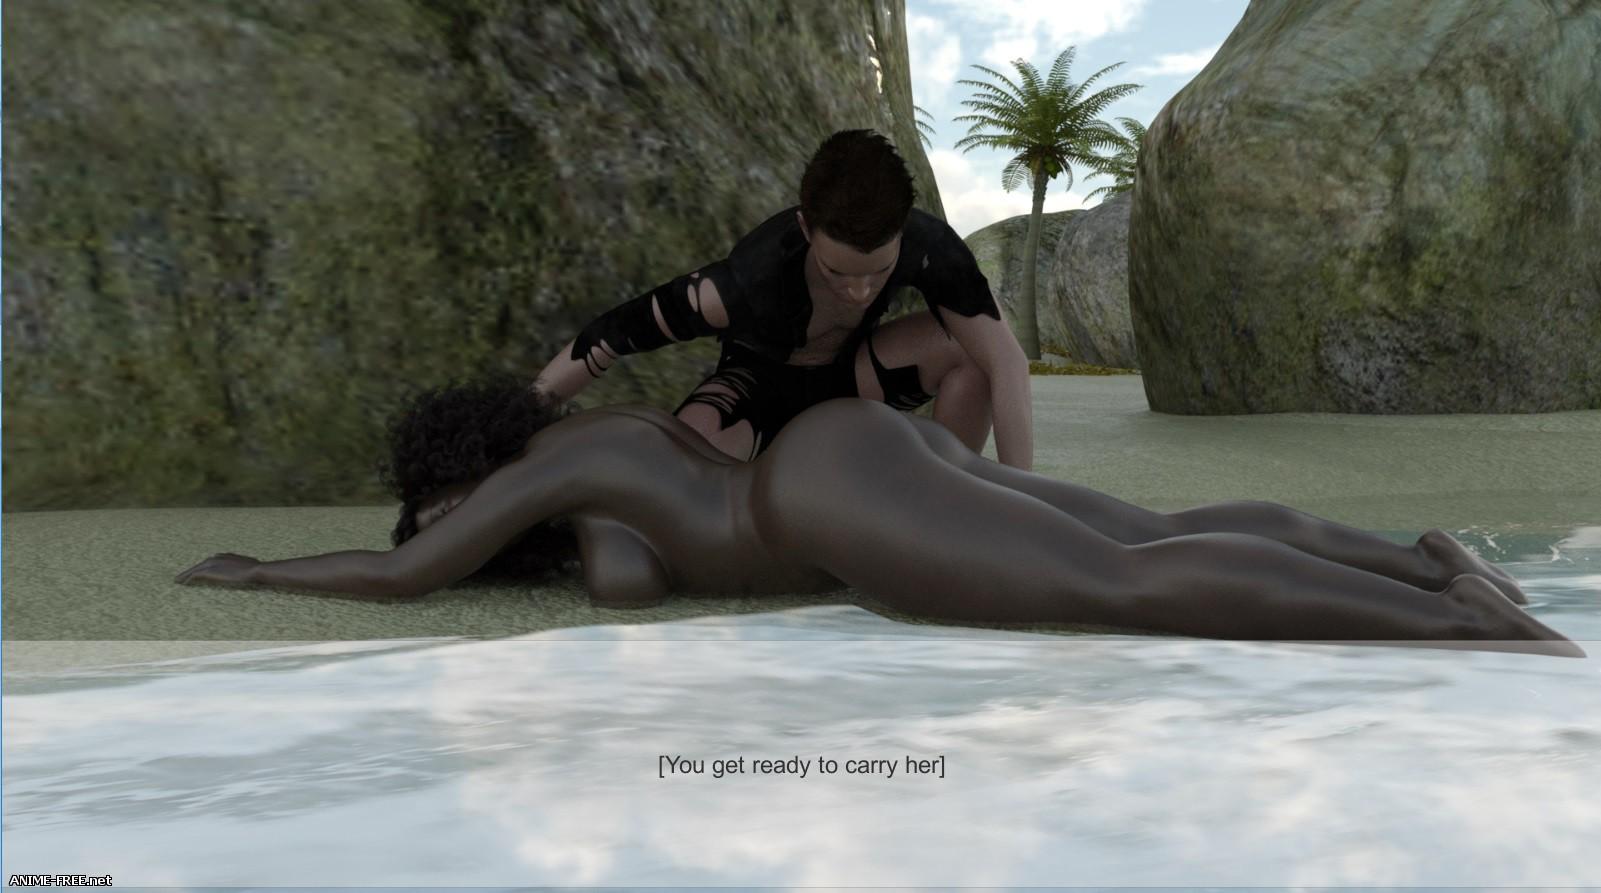 Paradise Island / Райский остров [2018] [Uncen] [ADV, 3DCG] [ENG] H-Game